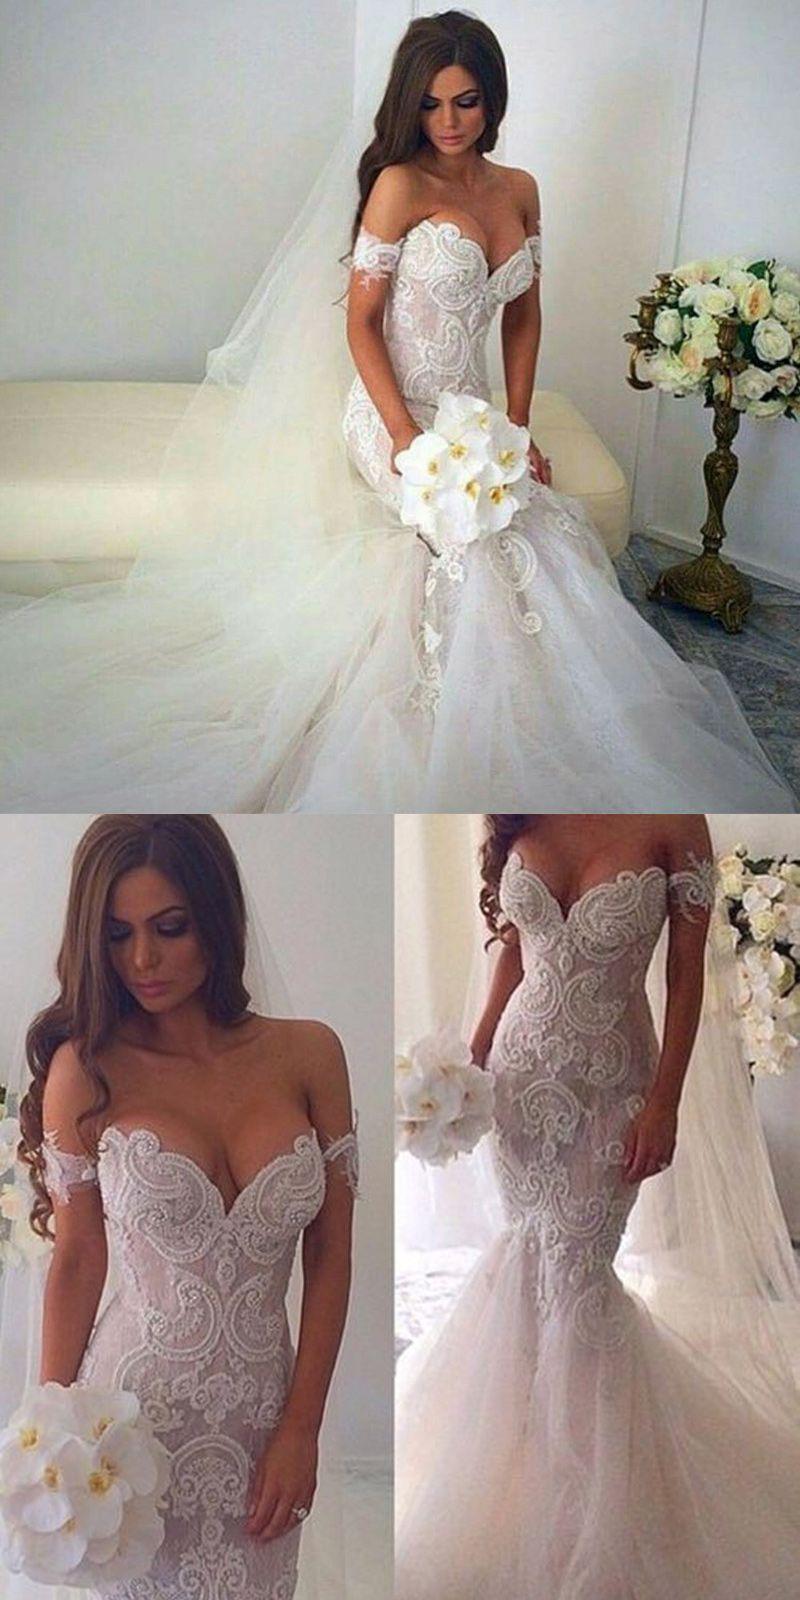 Ariel S Wedding Dress By Emilia89 Deviantart Com On Deviantart Ariel Wedding Dress Ariel Wedding Disney Princess Ariel [ 1017 x 786 Pixel ]